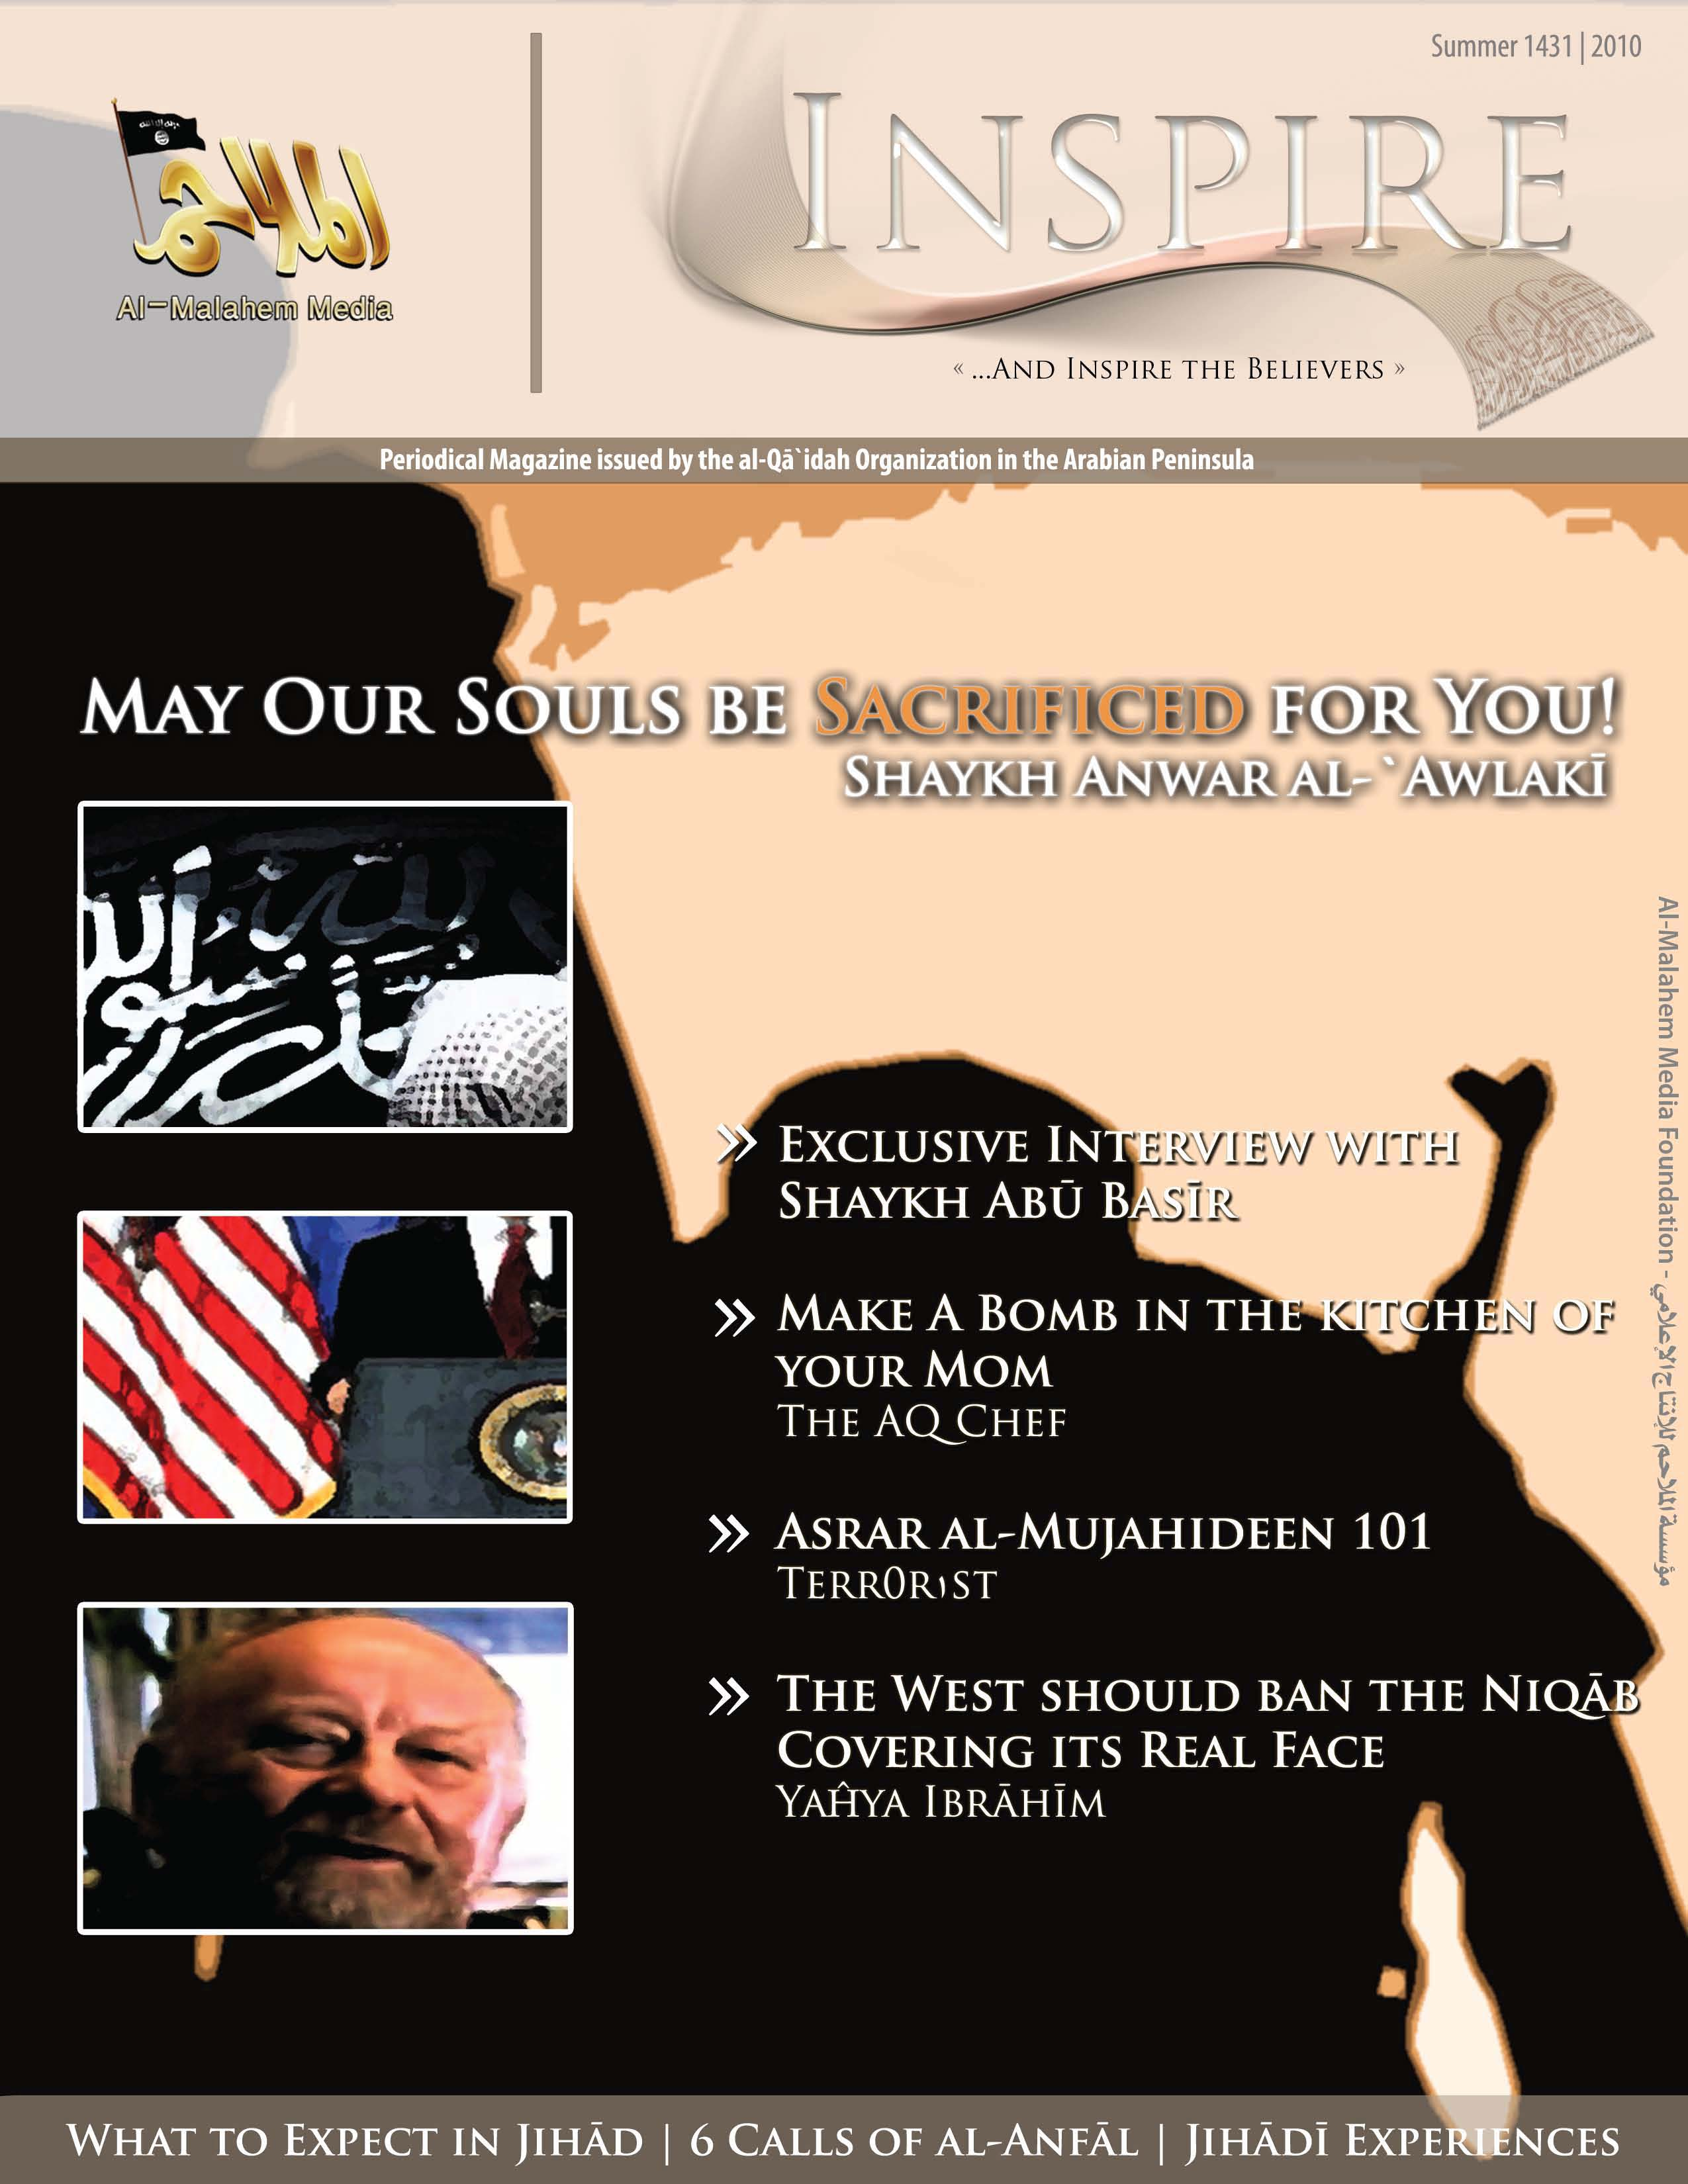 Complete Inspire Al-Qaeda in the Arabian Peninsula (AQAP ...